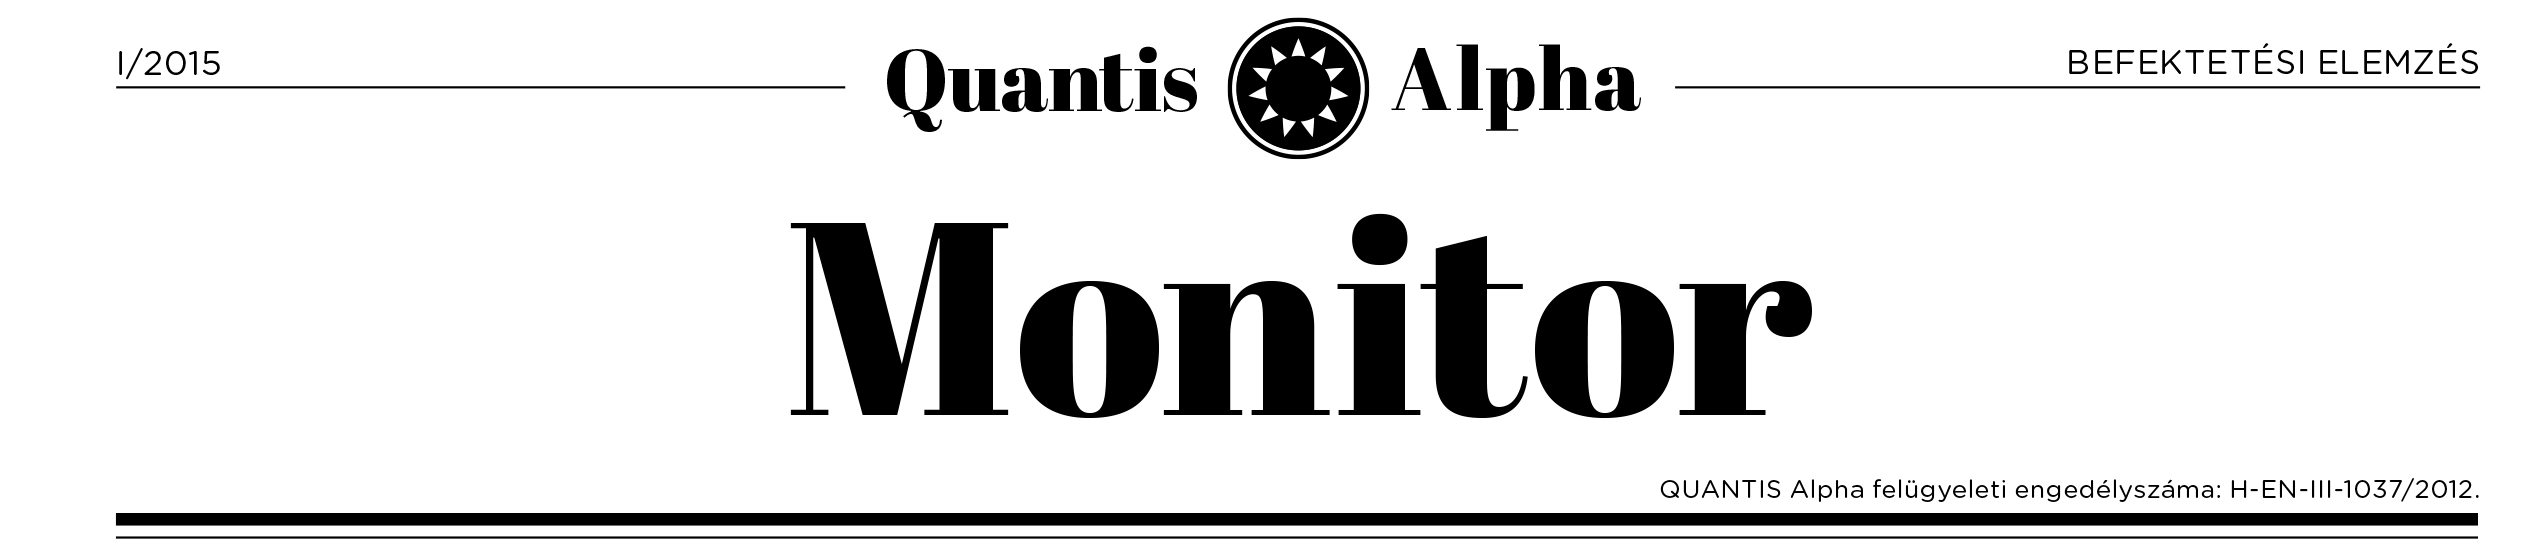 Monitor 2015 februar